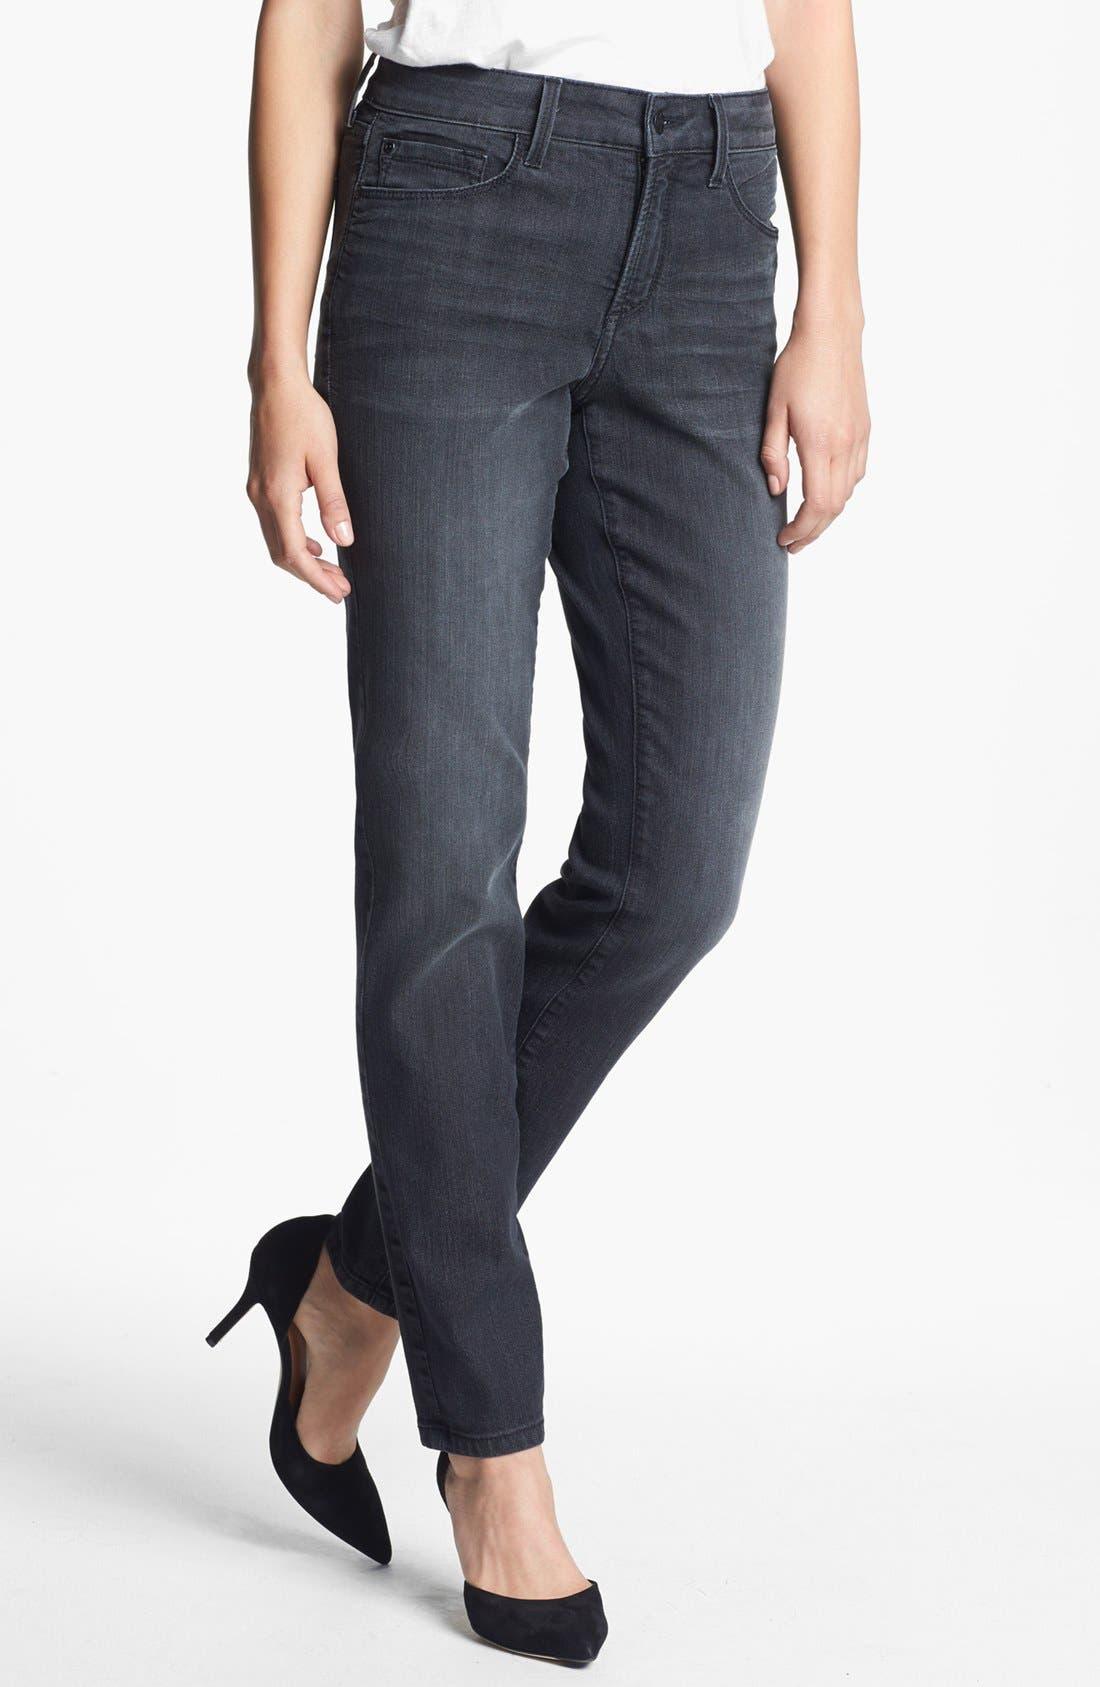 Alternate Image 1 Selected - NYDJ 'Alina' Stretch Skinny Jeans (Stoney River) (Regular & Petite)